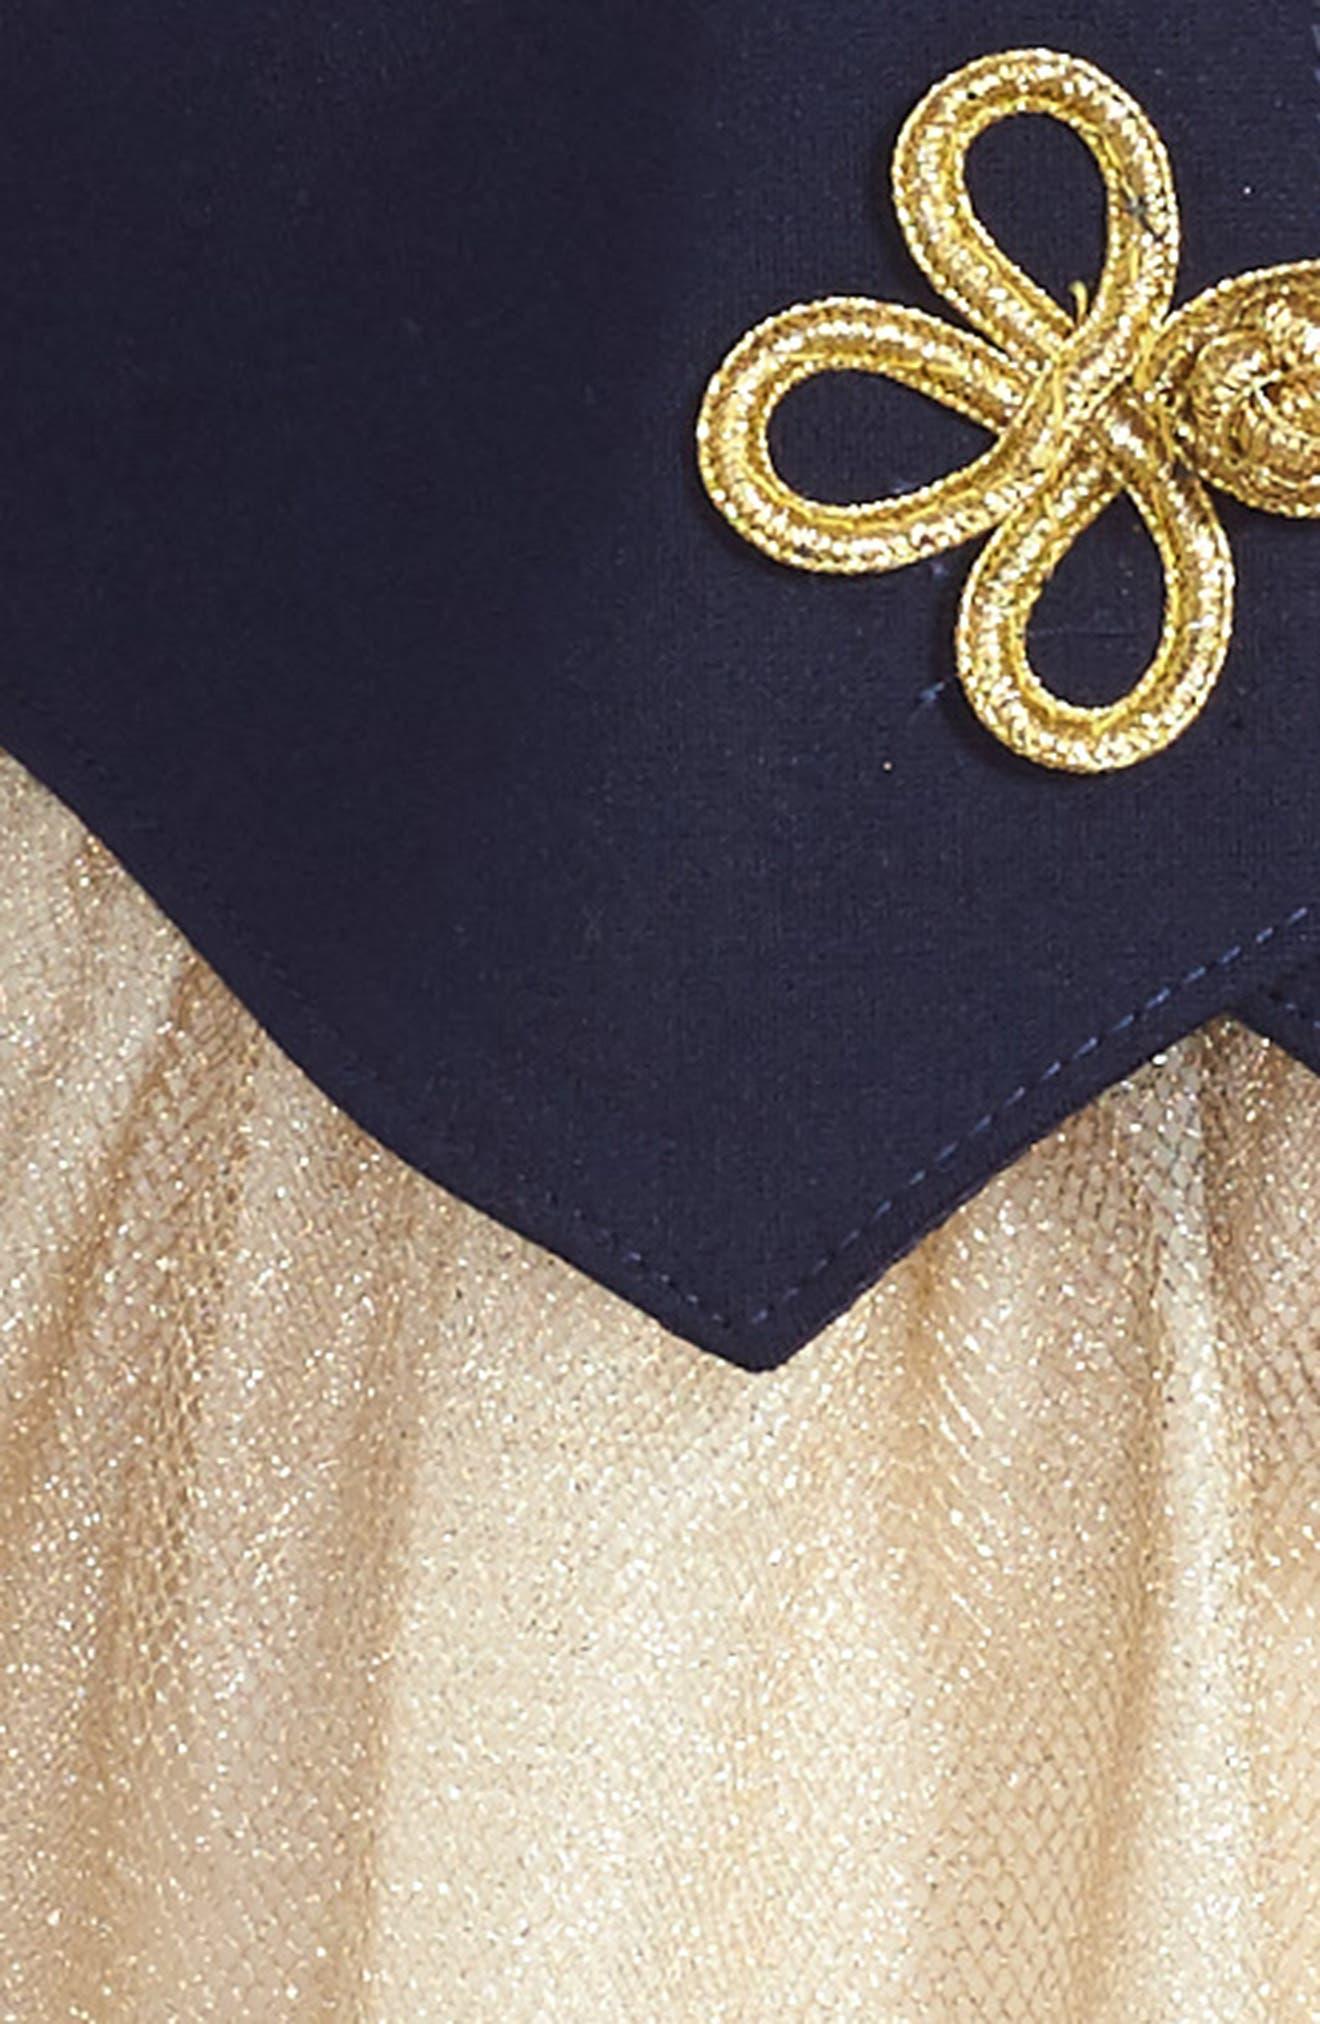 Majorette Jacket & Tank Dress Set,                             Alternate thumbnail 4, color,                             Navy/ Gold